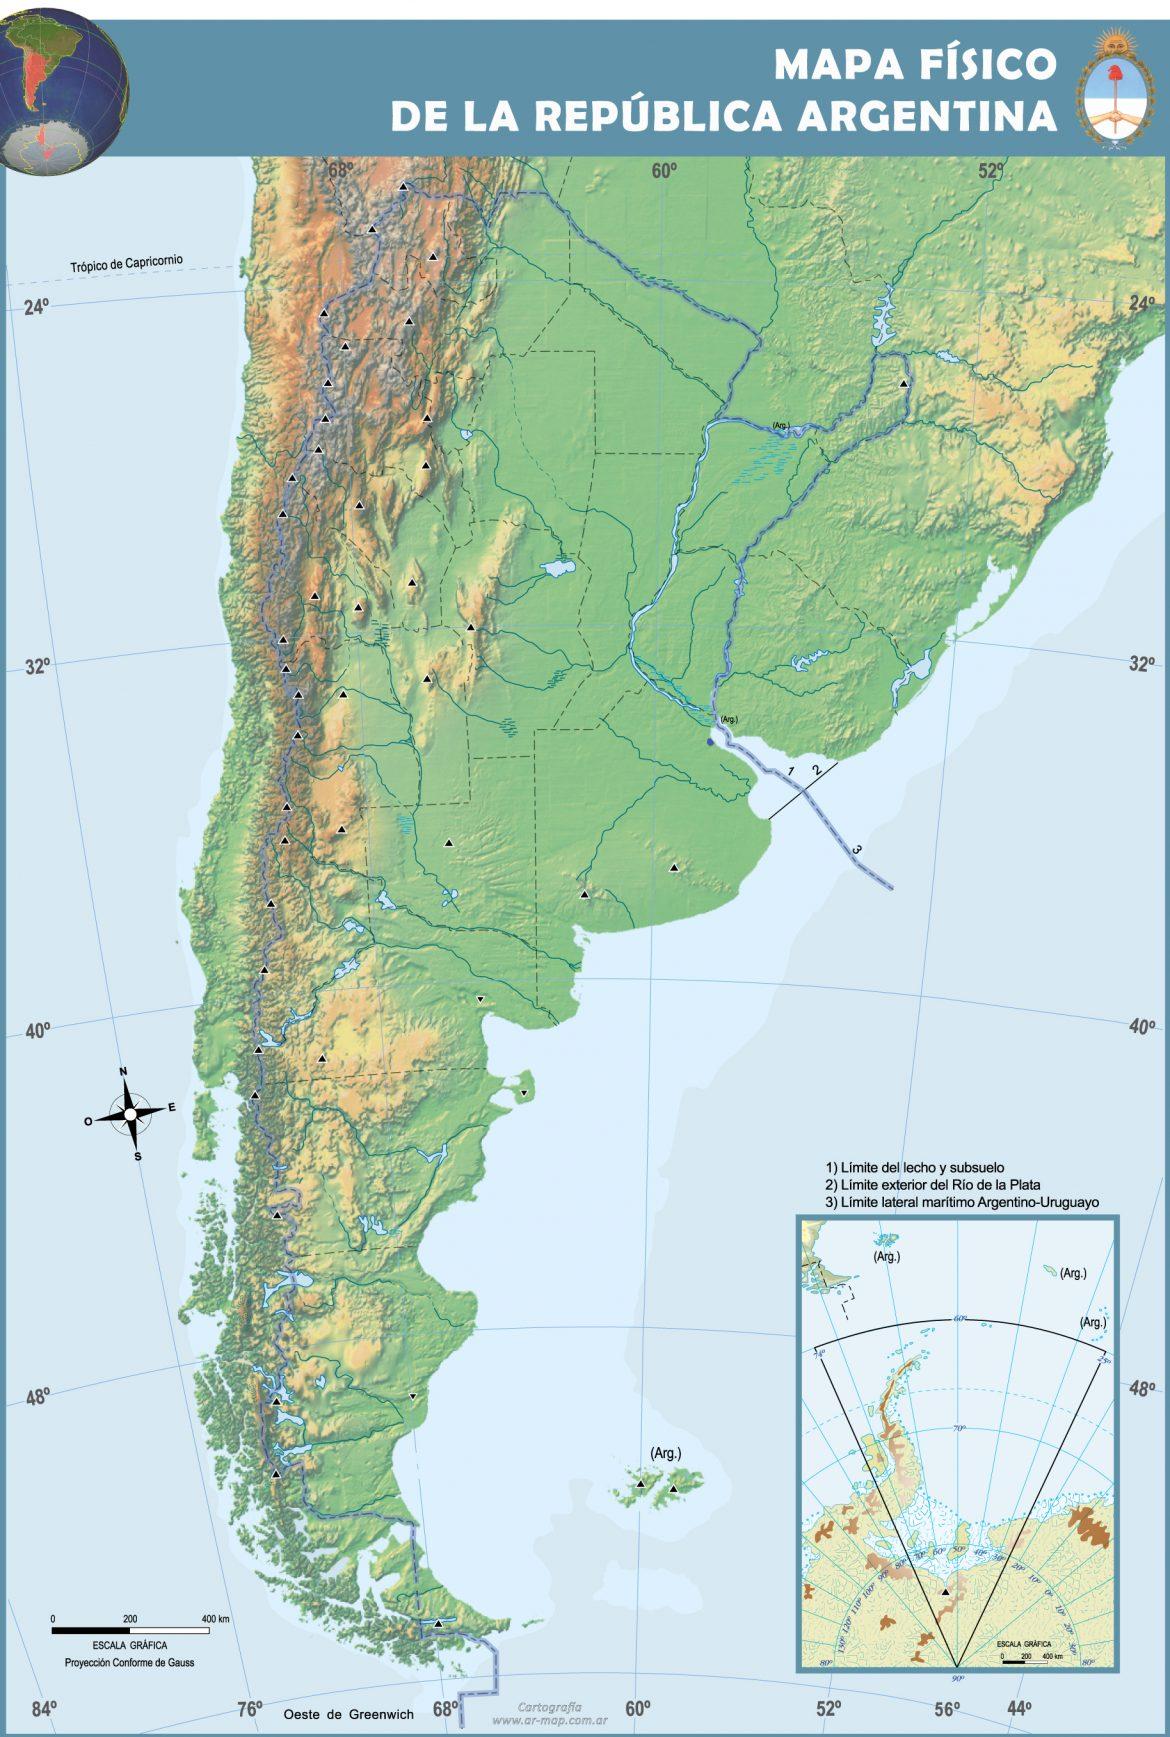 Mapa fisico mudo de america para imprimir en a4, masquelibros